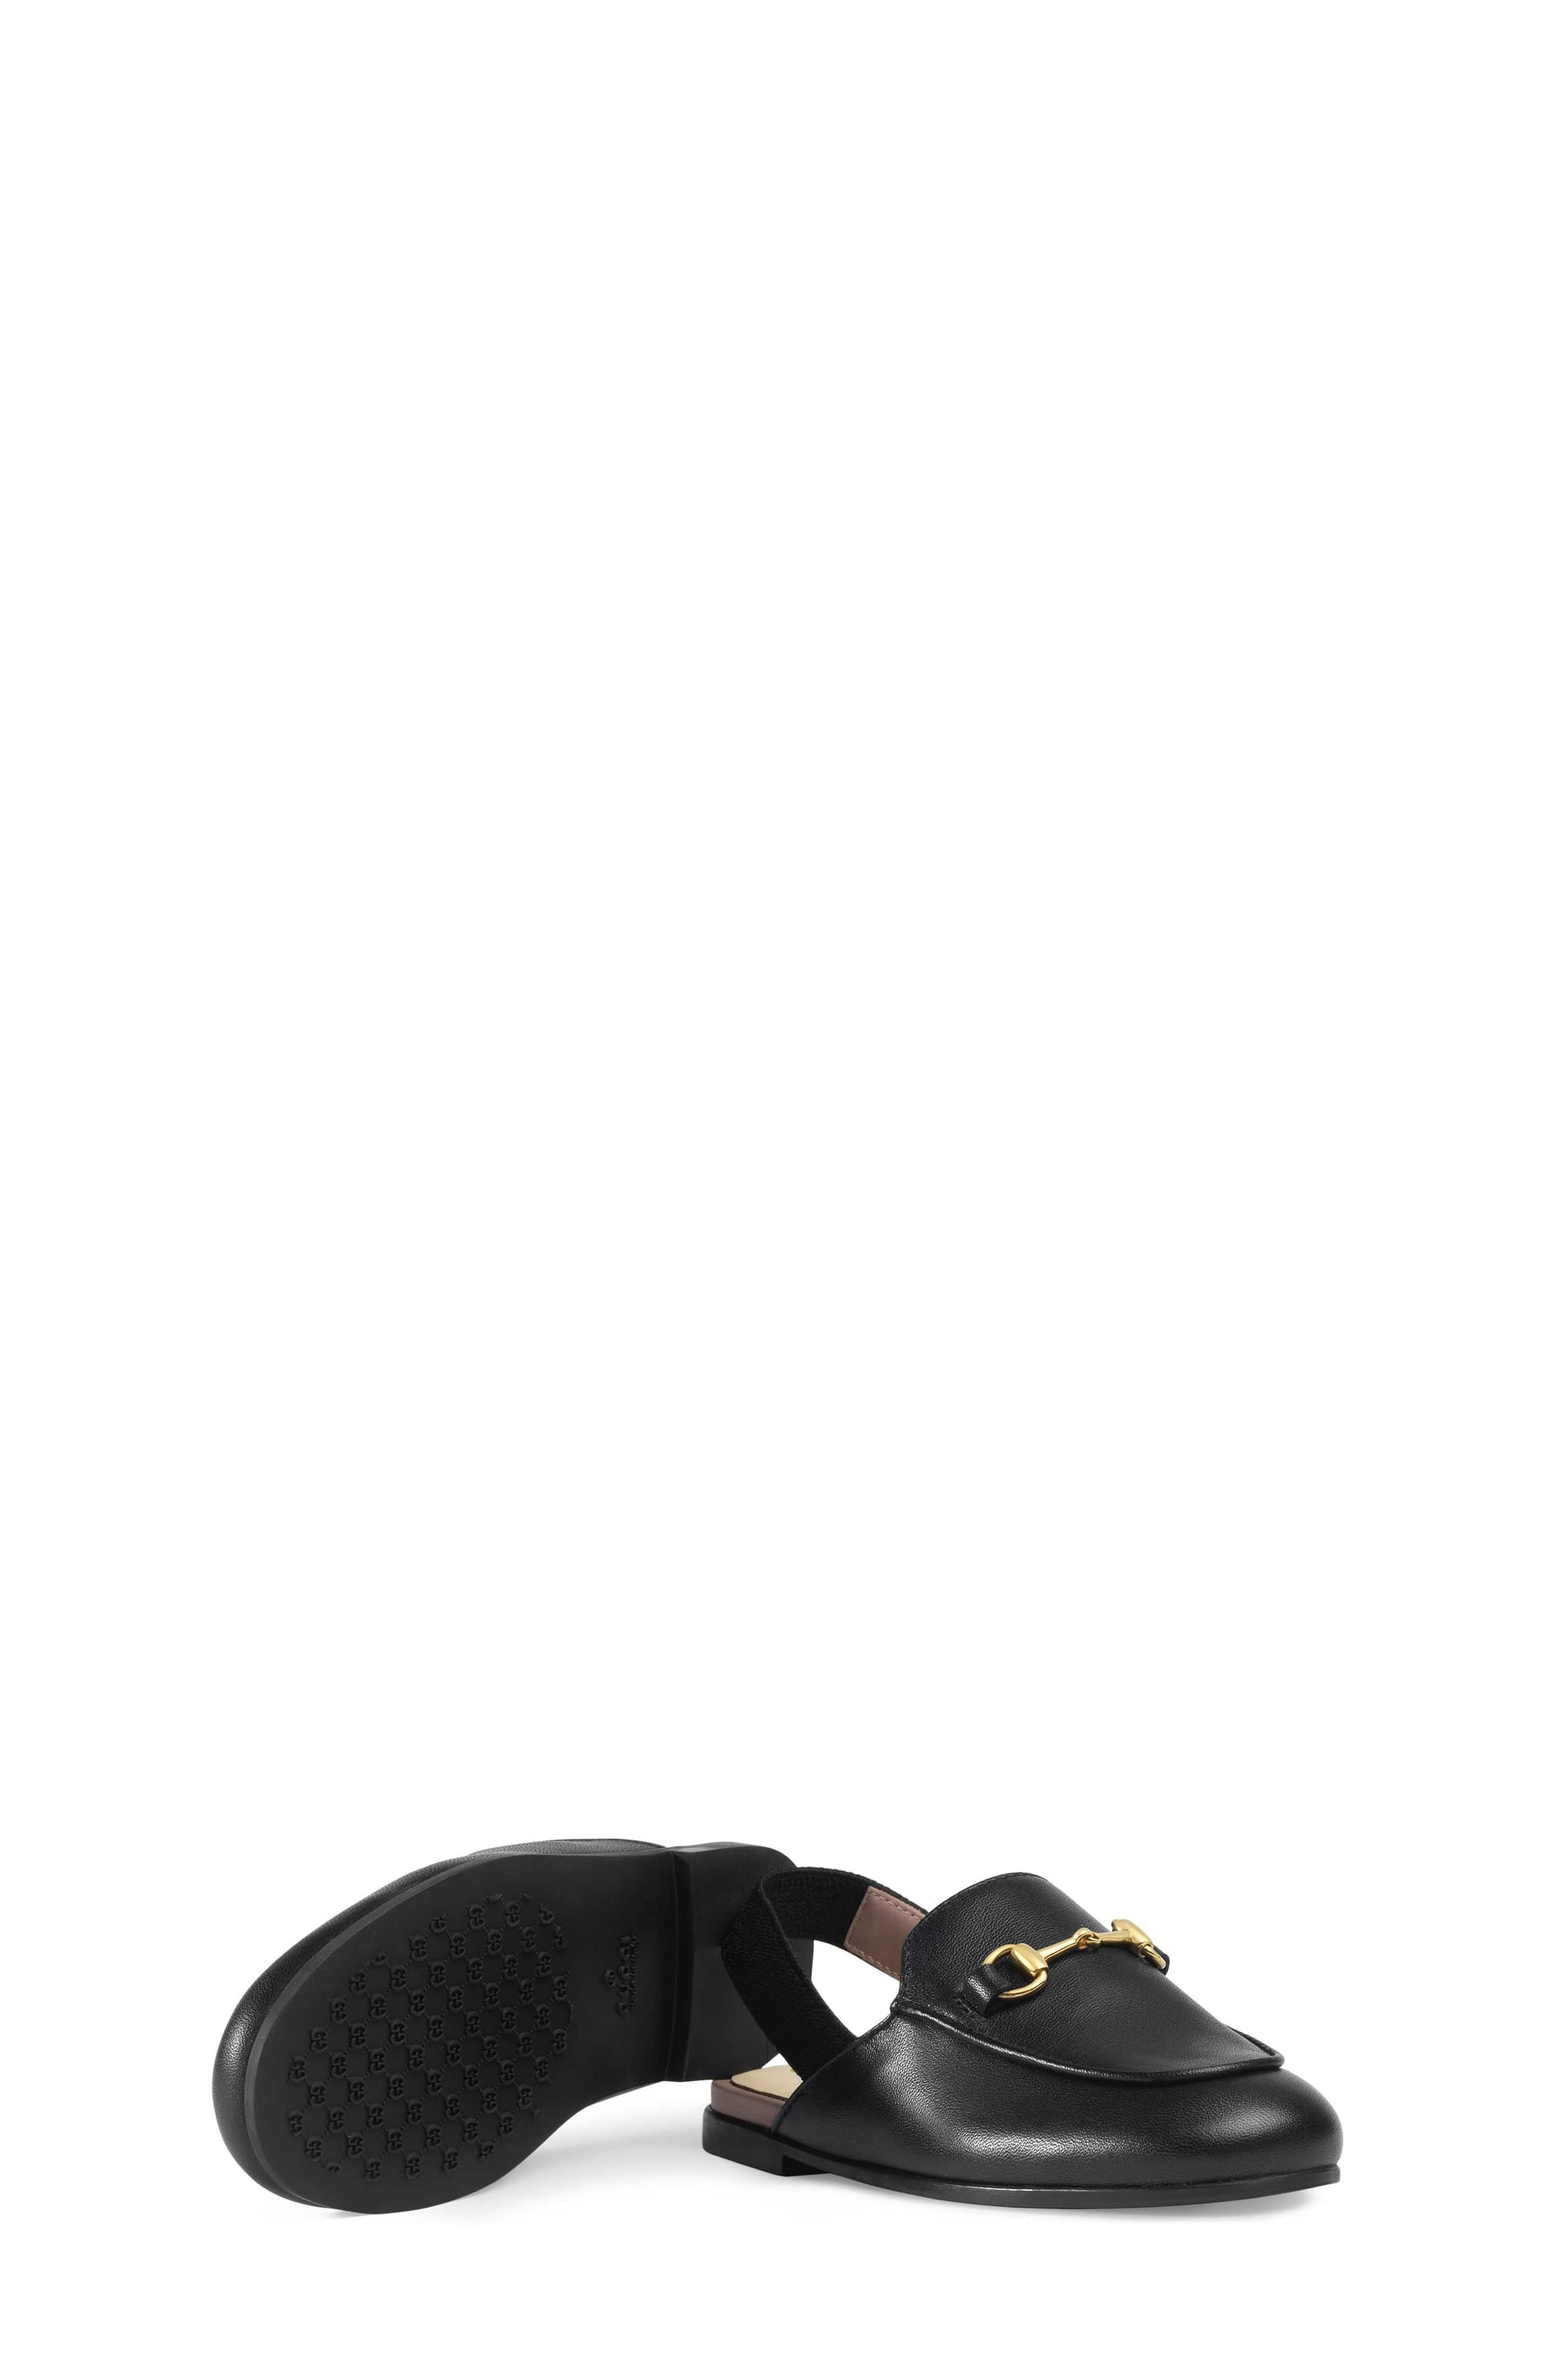 Princetown Loafer Mule,                             Alternate thumbnail 7, color,                             BLACK/ BLACK